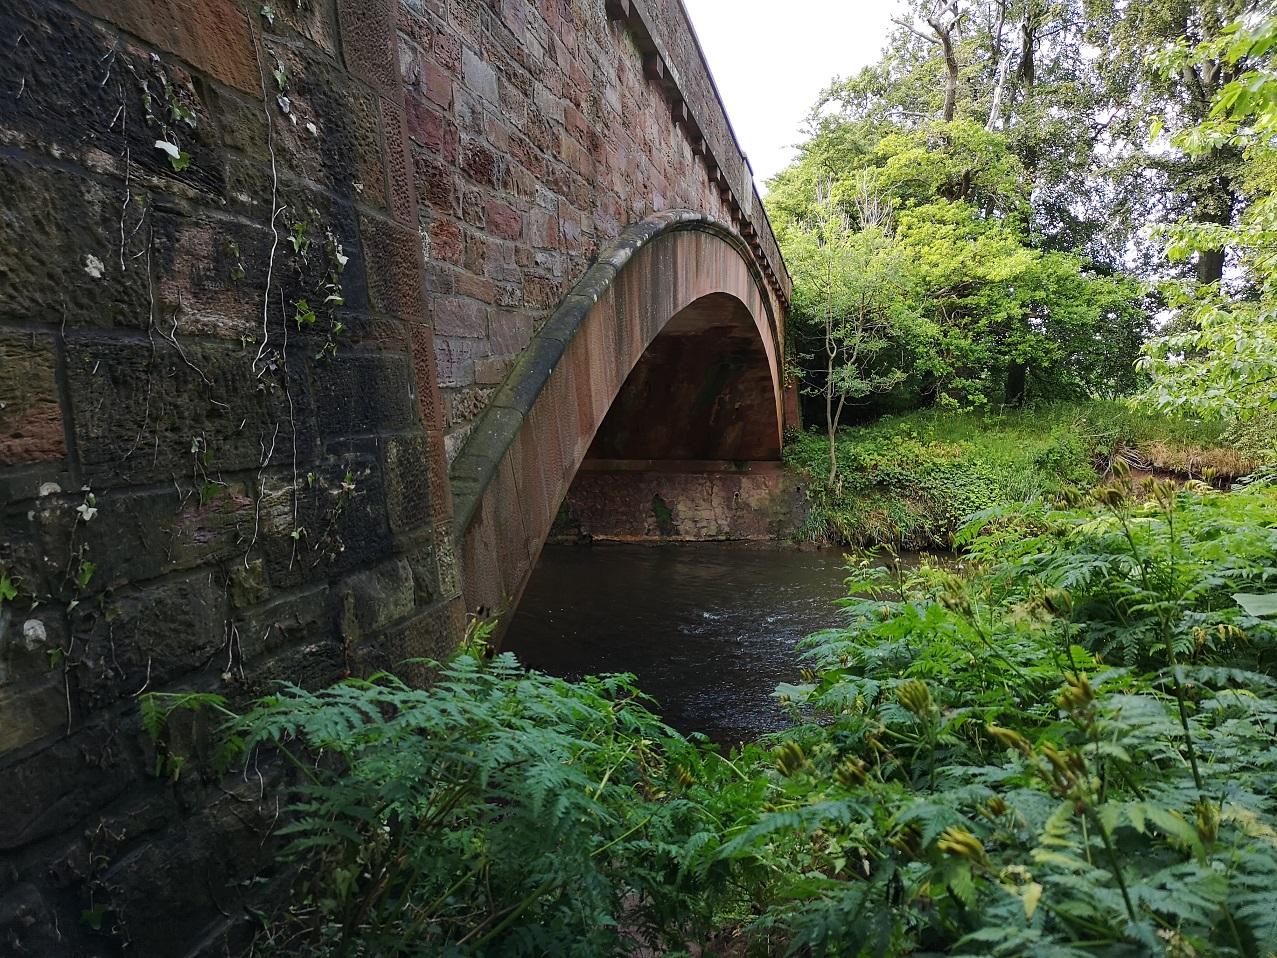 River flowing under bridge